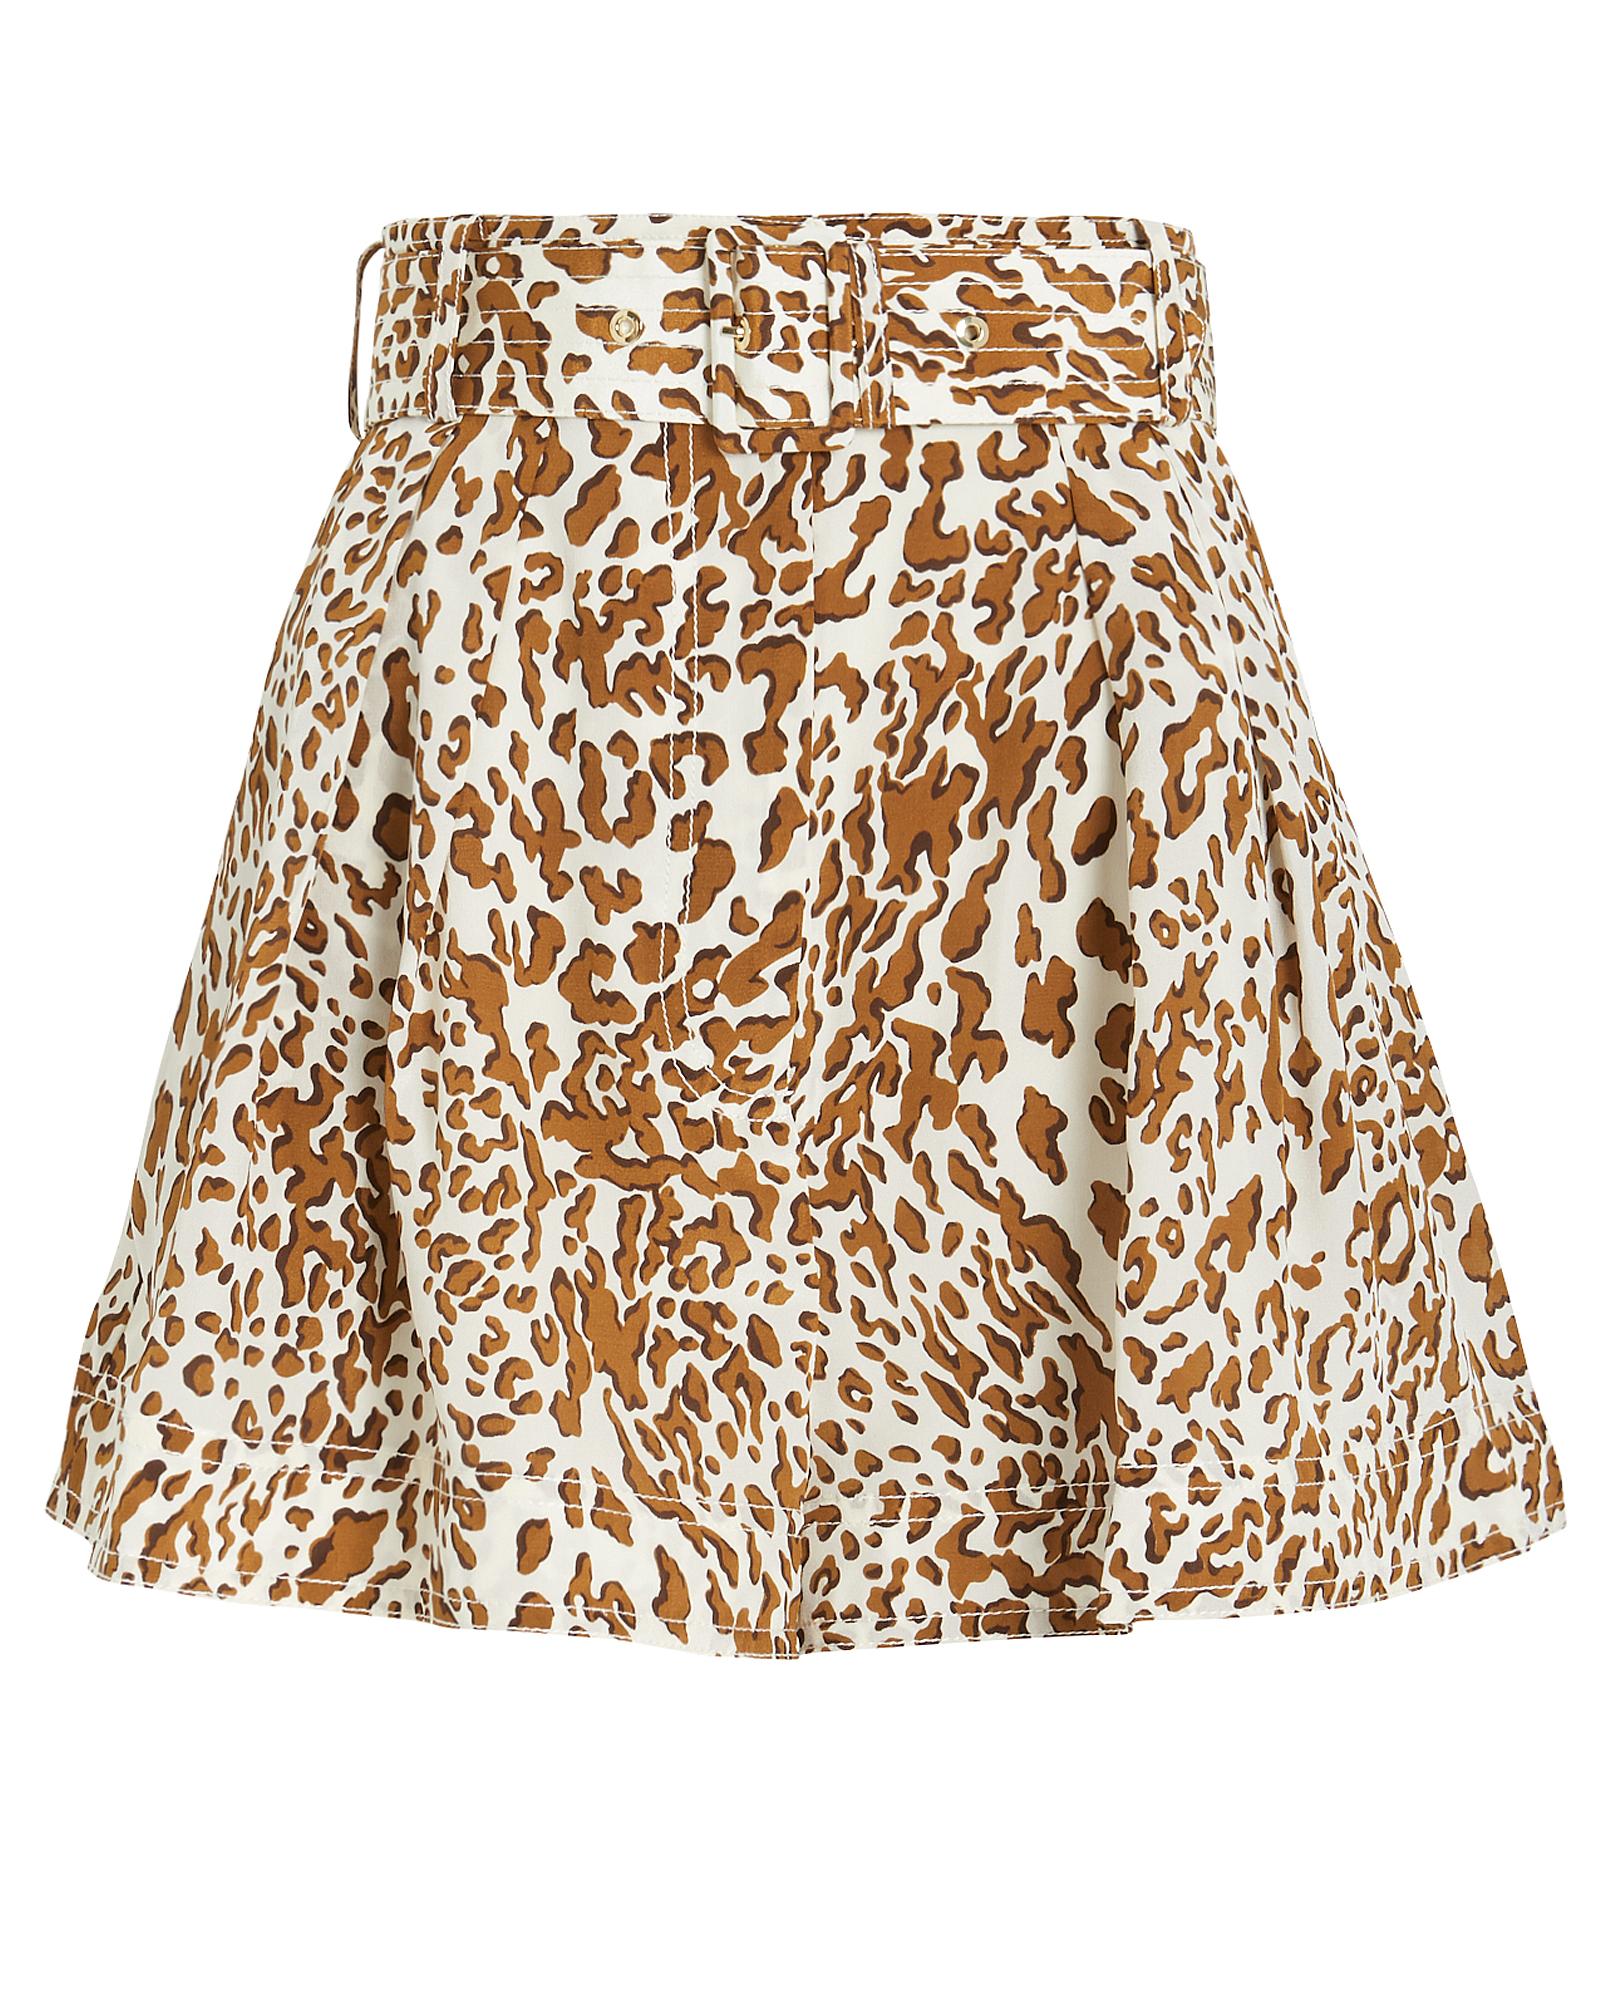 0101e4bf13 Women's Shorts - Shop Worldwide Fashion - SeekFab